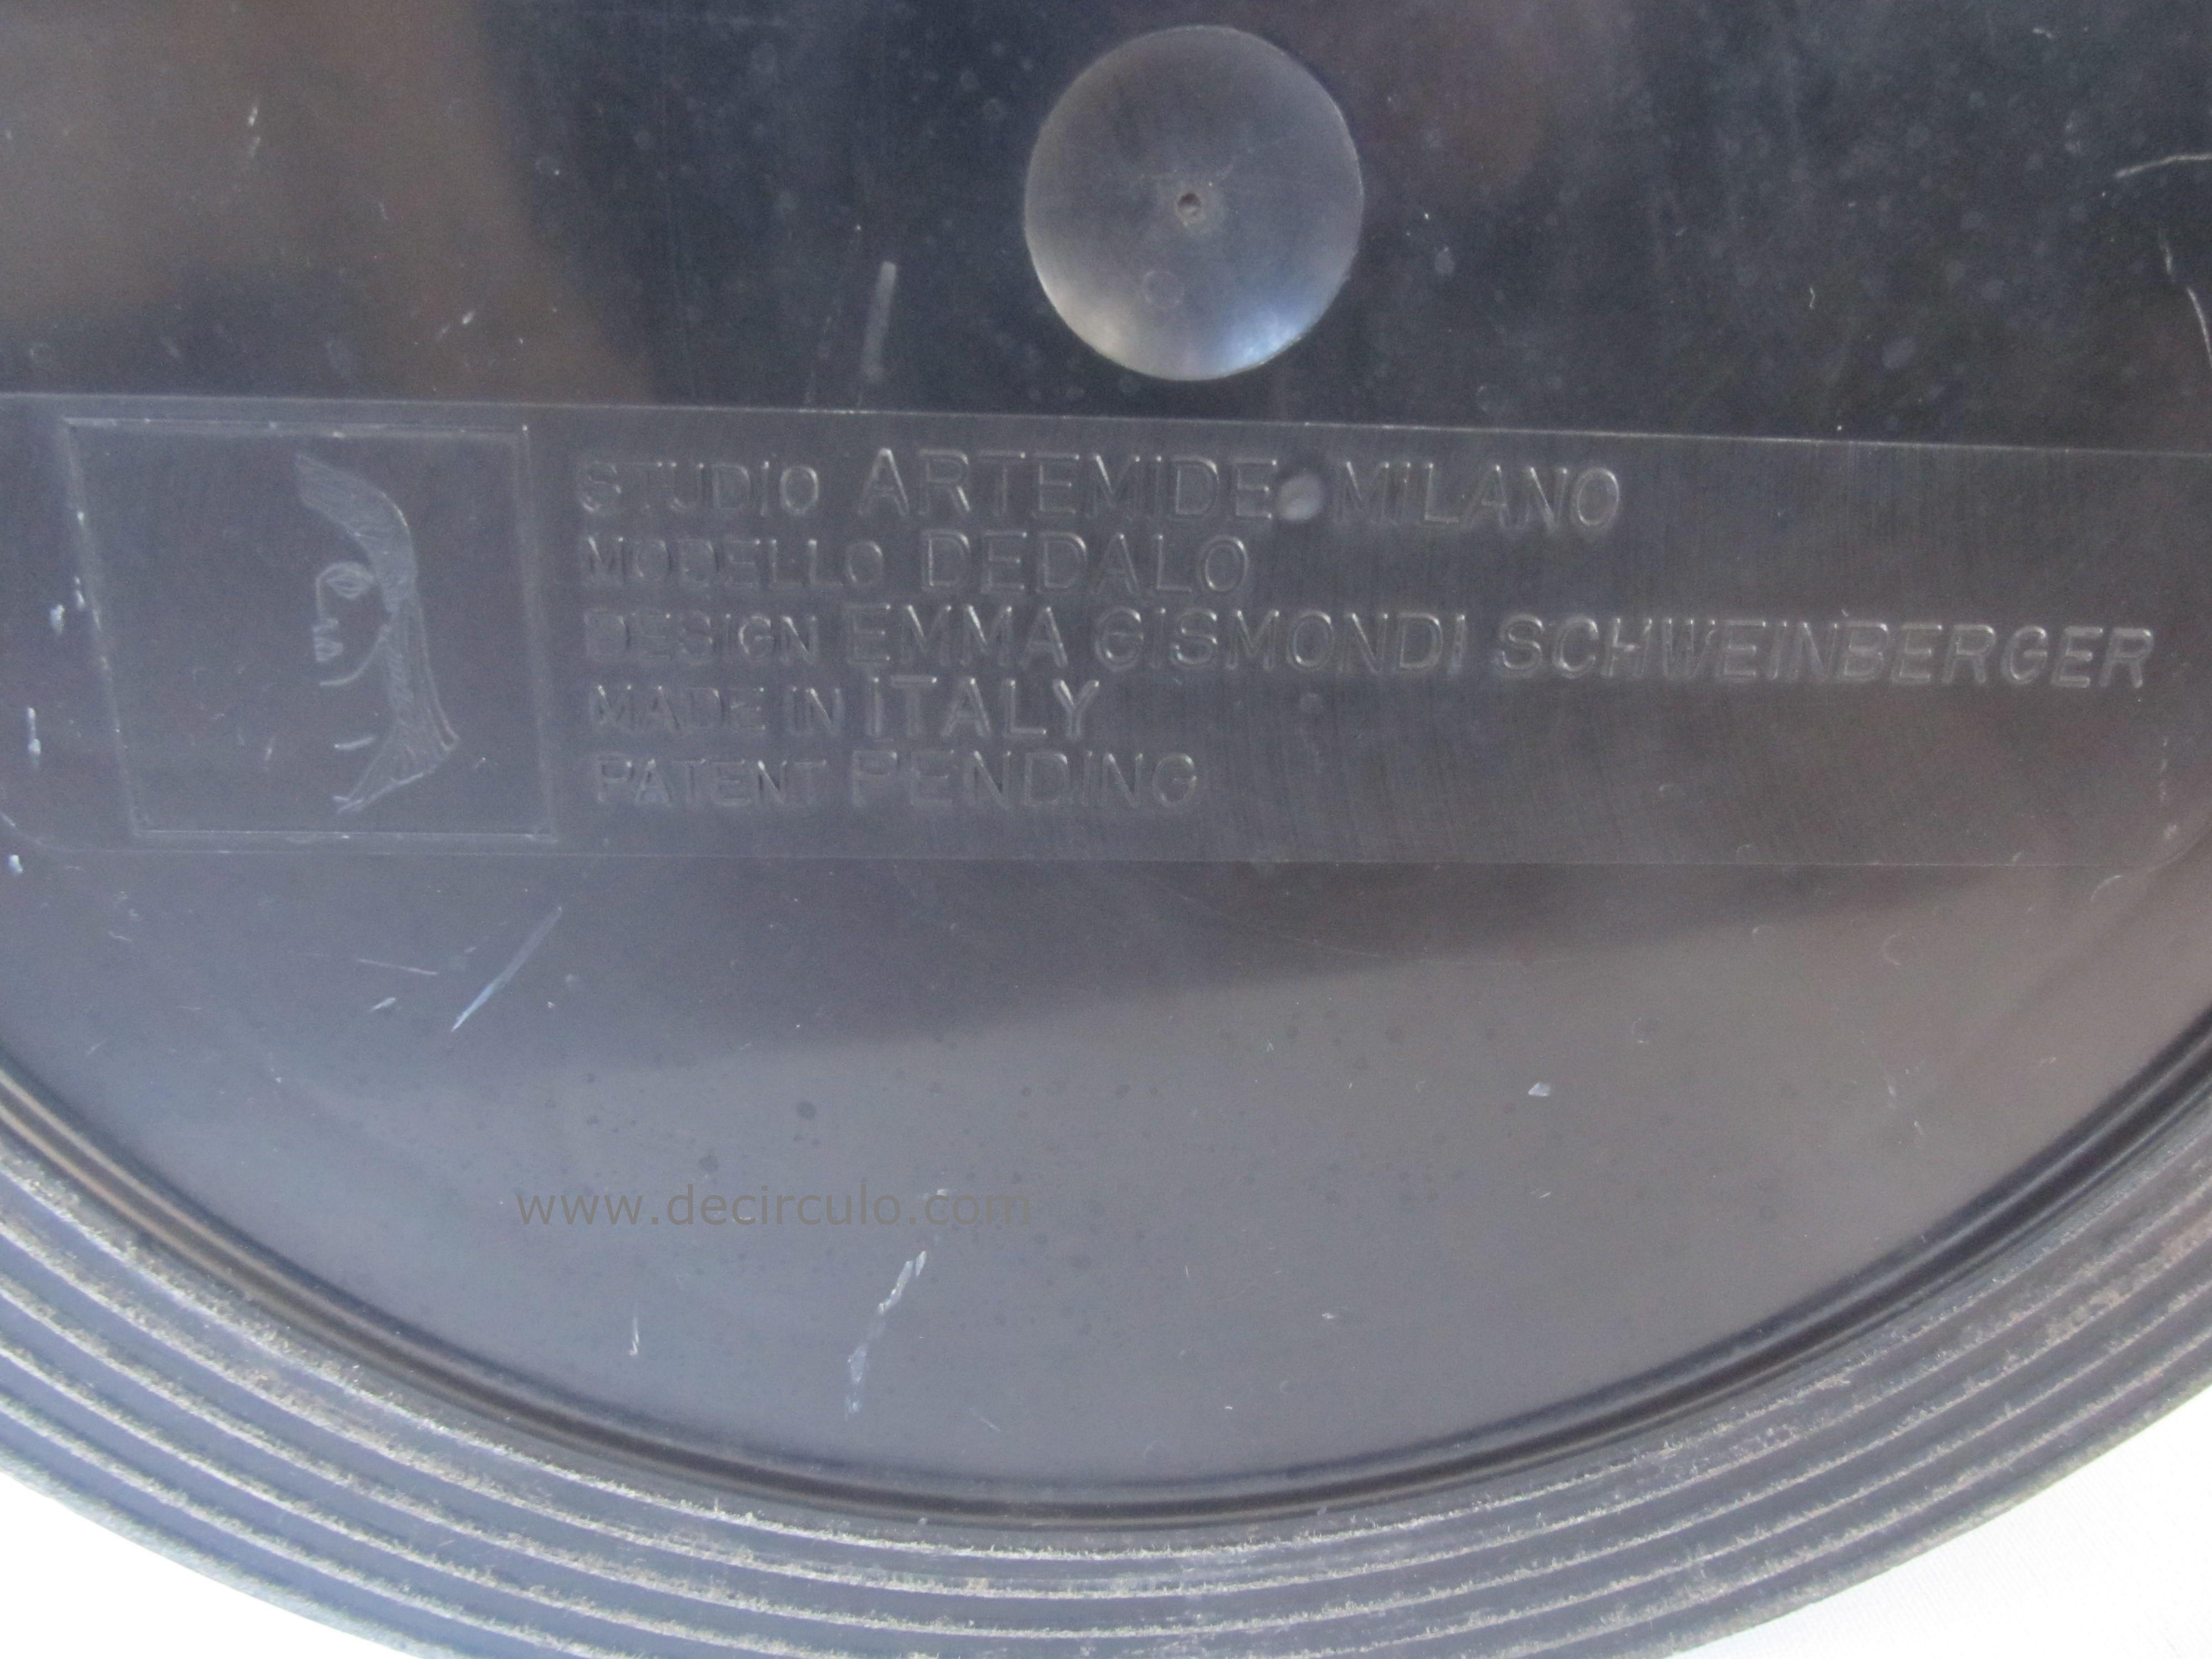 Logo Dedalo Emma Gismondi Schweinberger Artemide